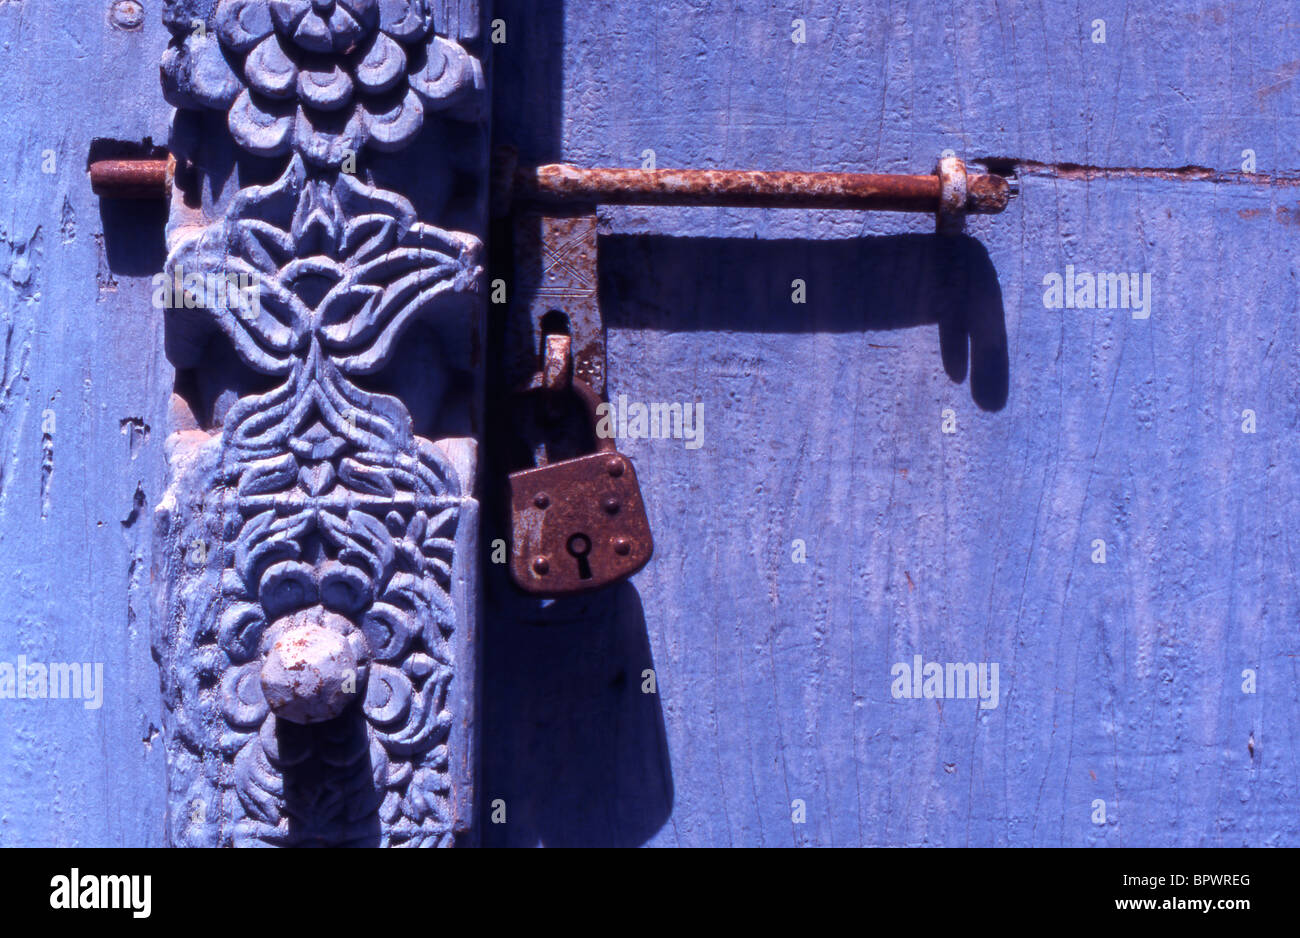 Detail of wooden engraving on a locked door in Stone Town, Zanzibar, Tanzania. Stock Photo